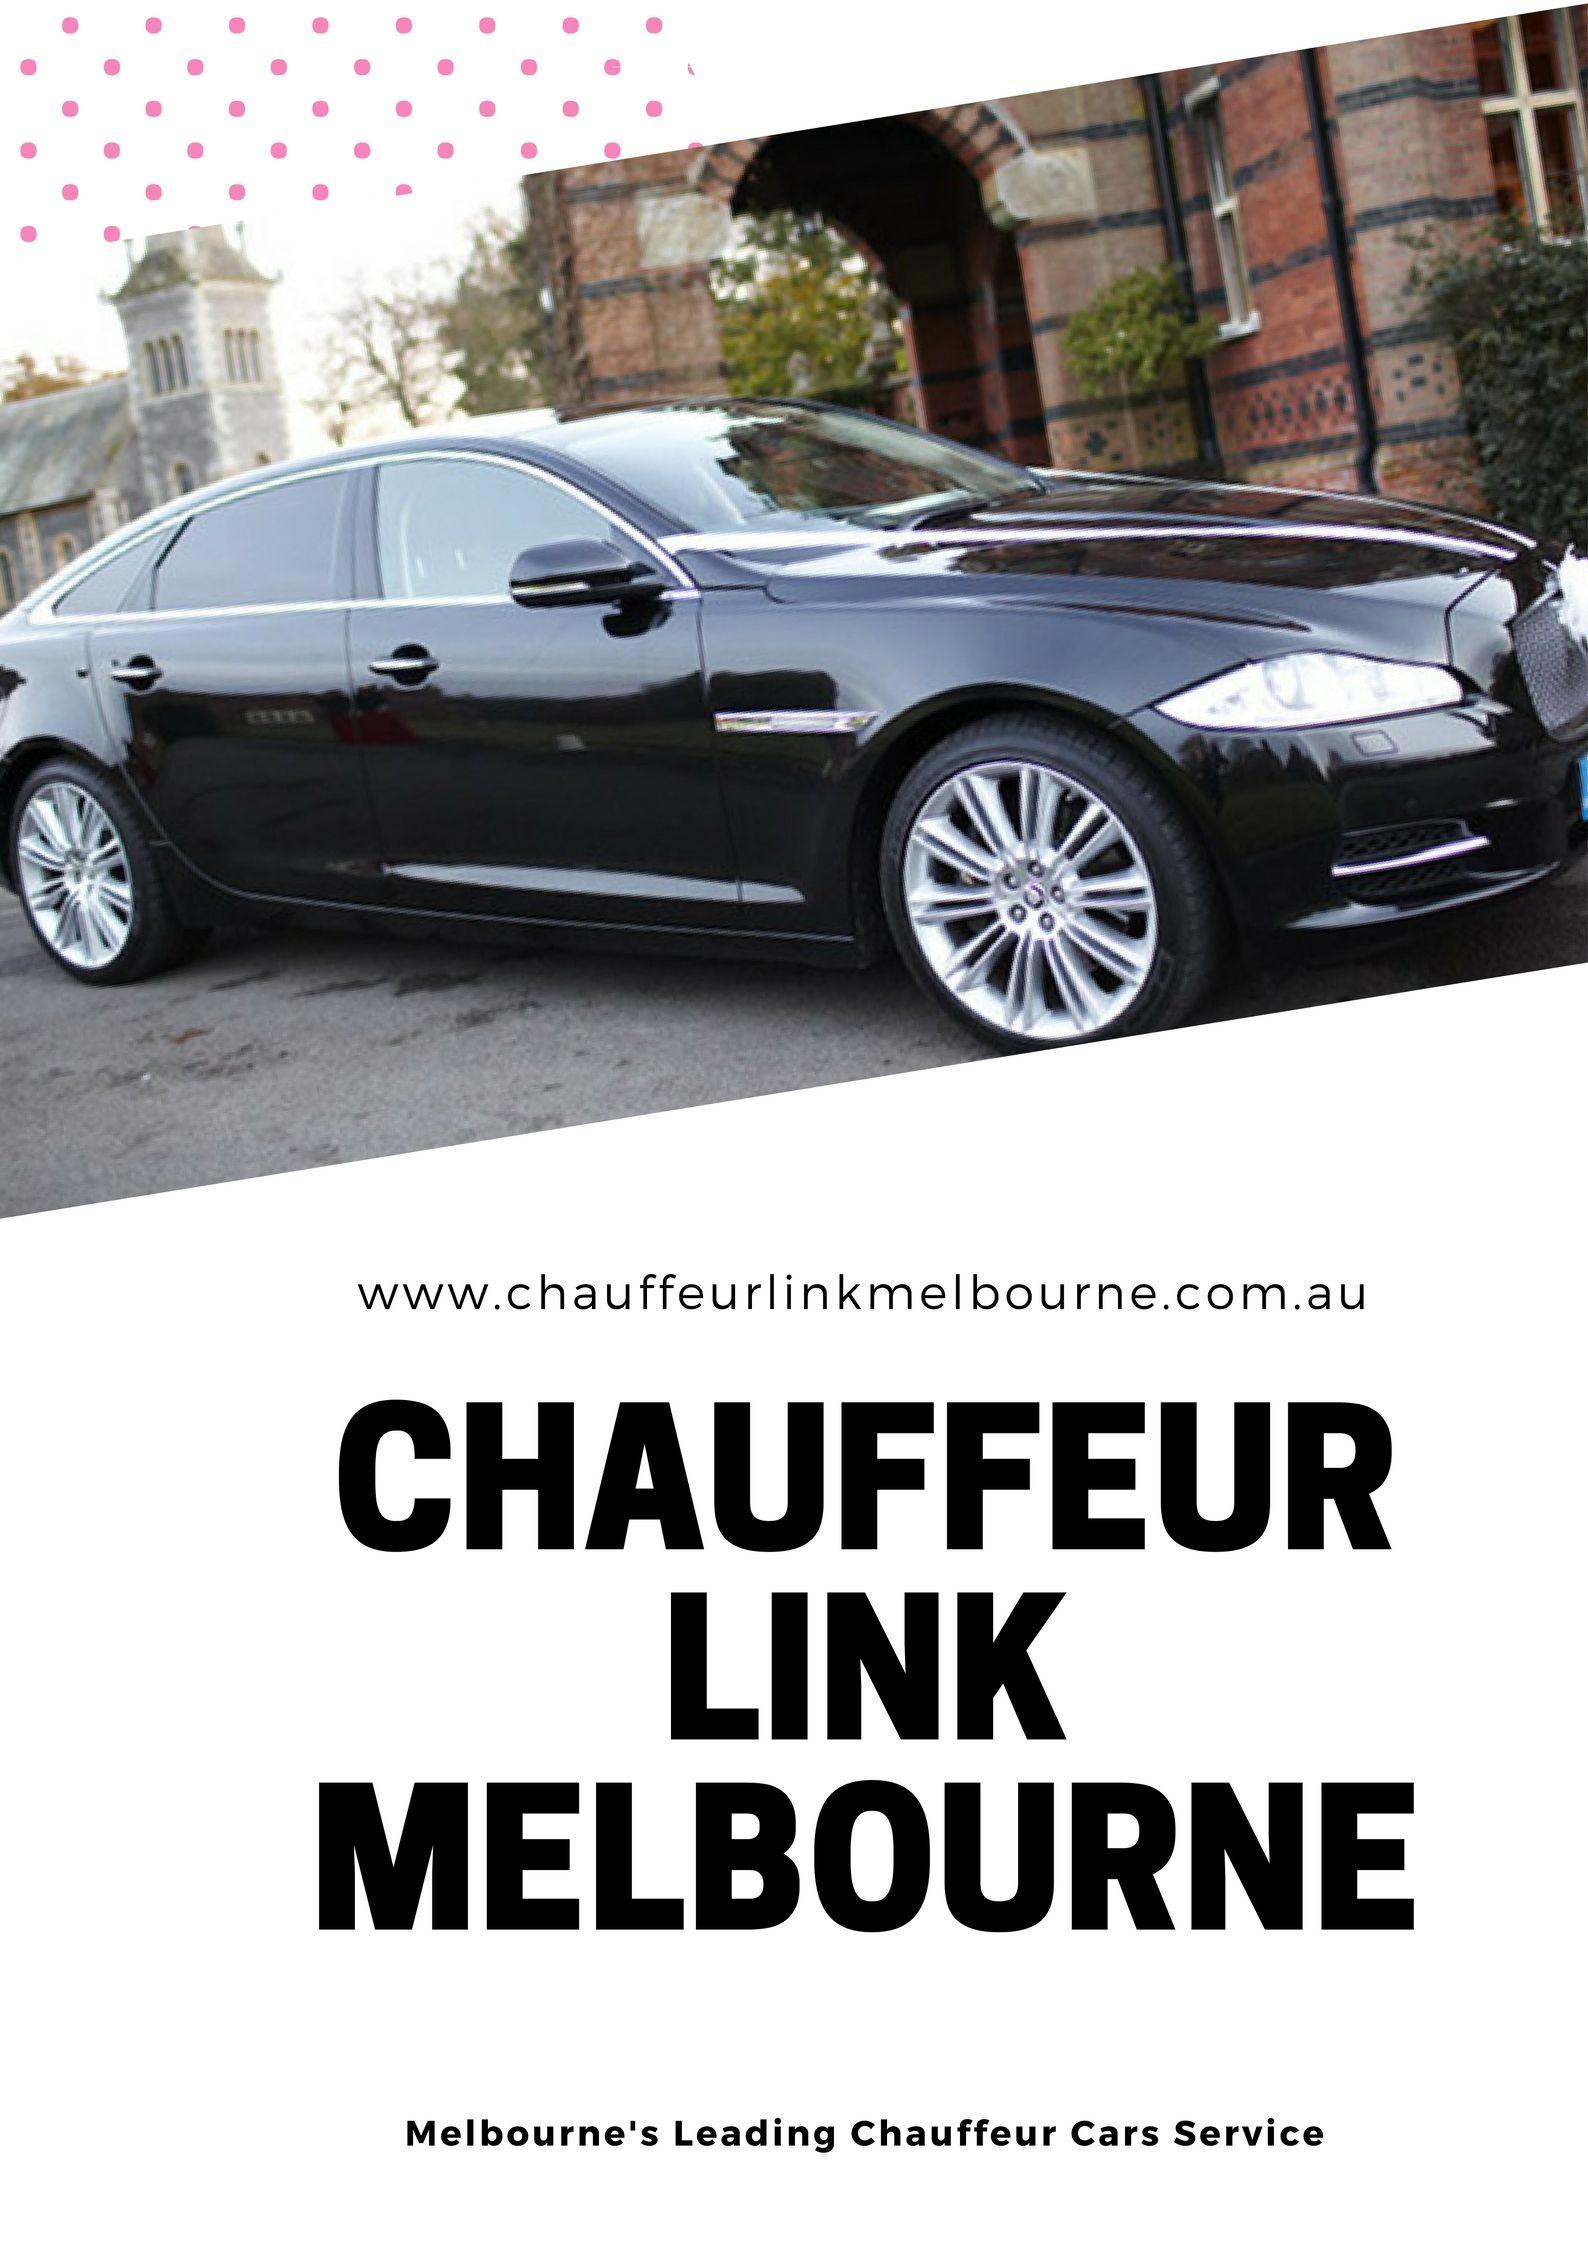 Chauffeur Hire Melbourne Melbourne Airport Chauffeur Car Service